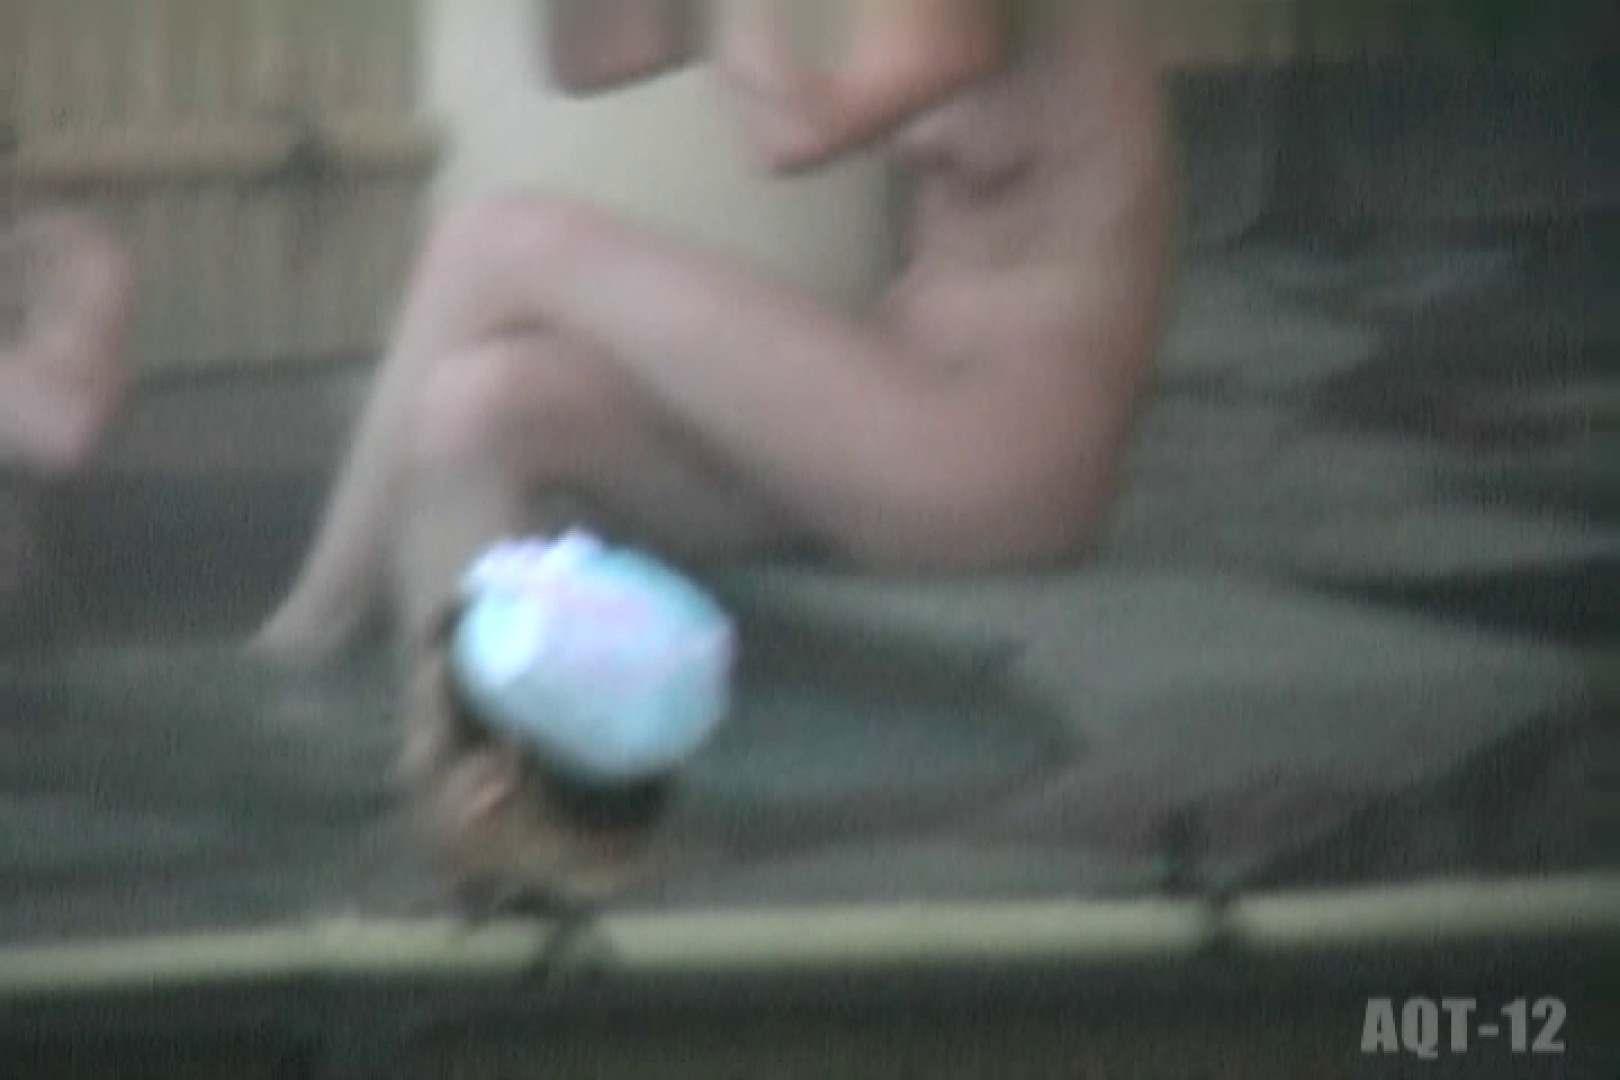 Aquaな露天風呂Vol.812 OLセックス | 露天  49画像 10